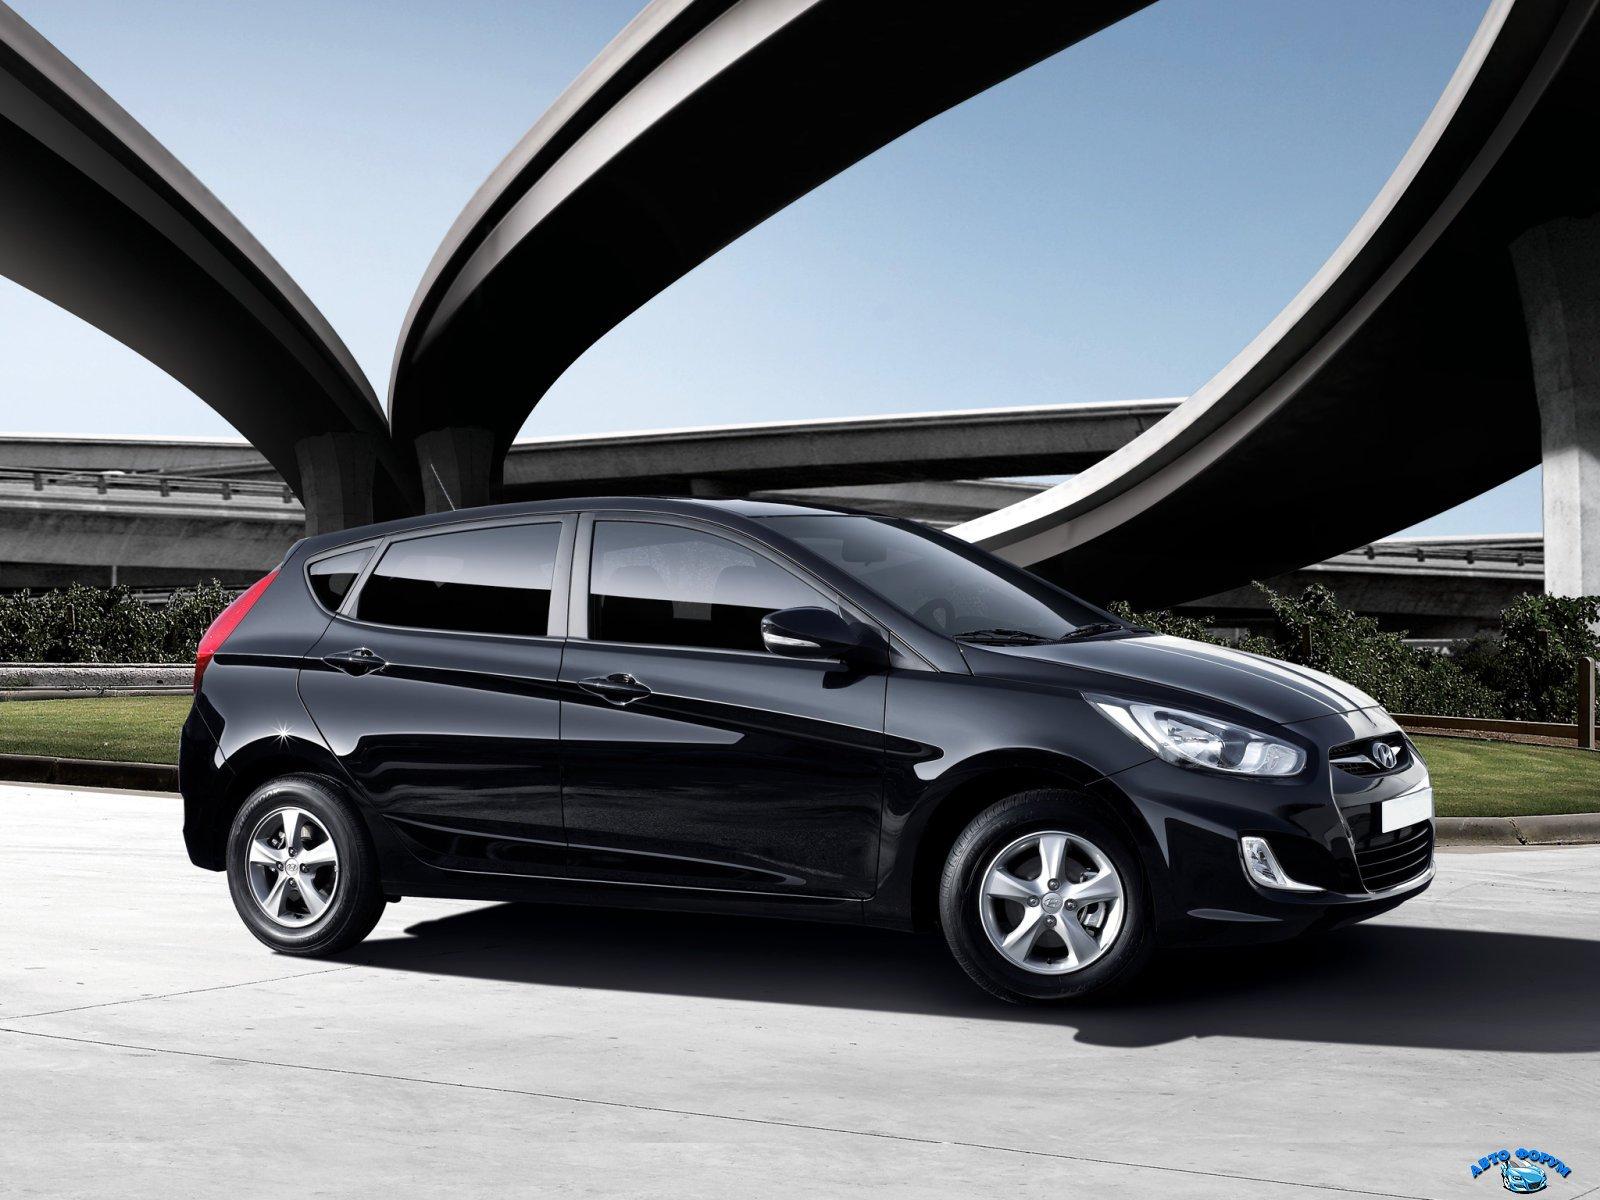 Hyundai_Solaris_Hatchback 5 door_2011.jpg